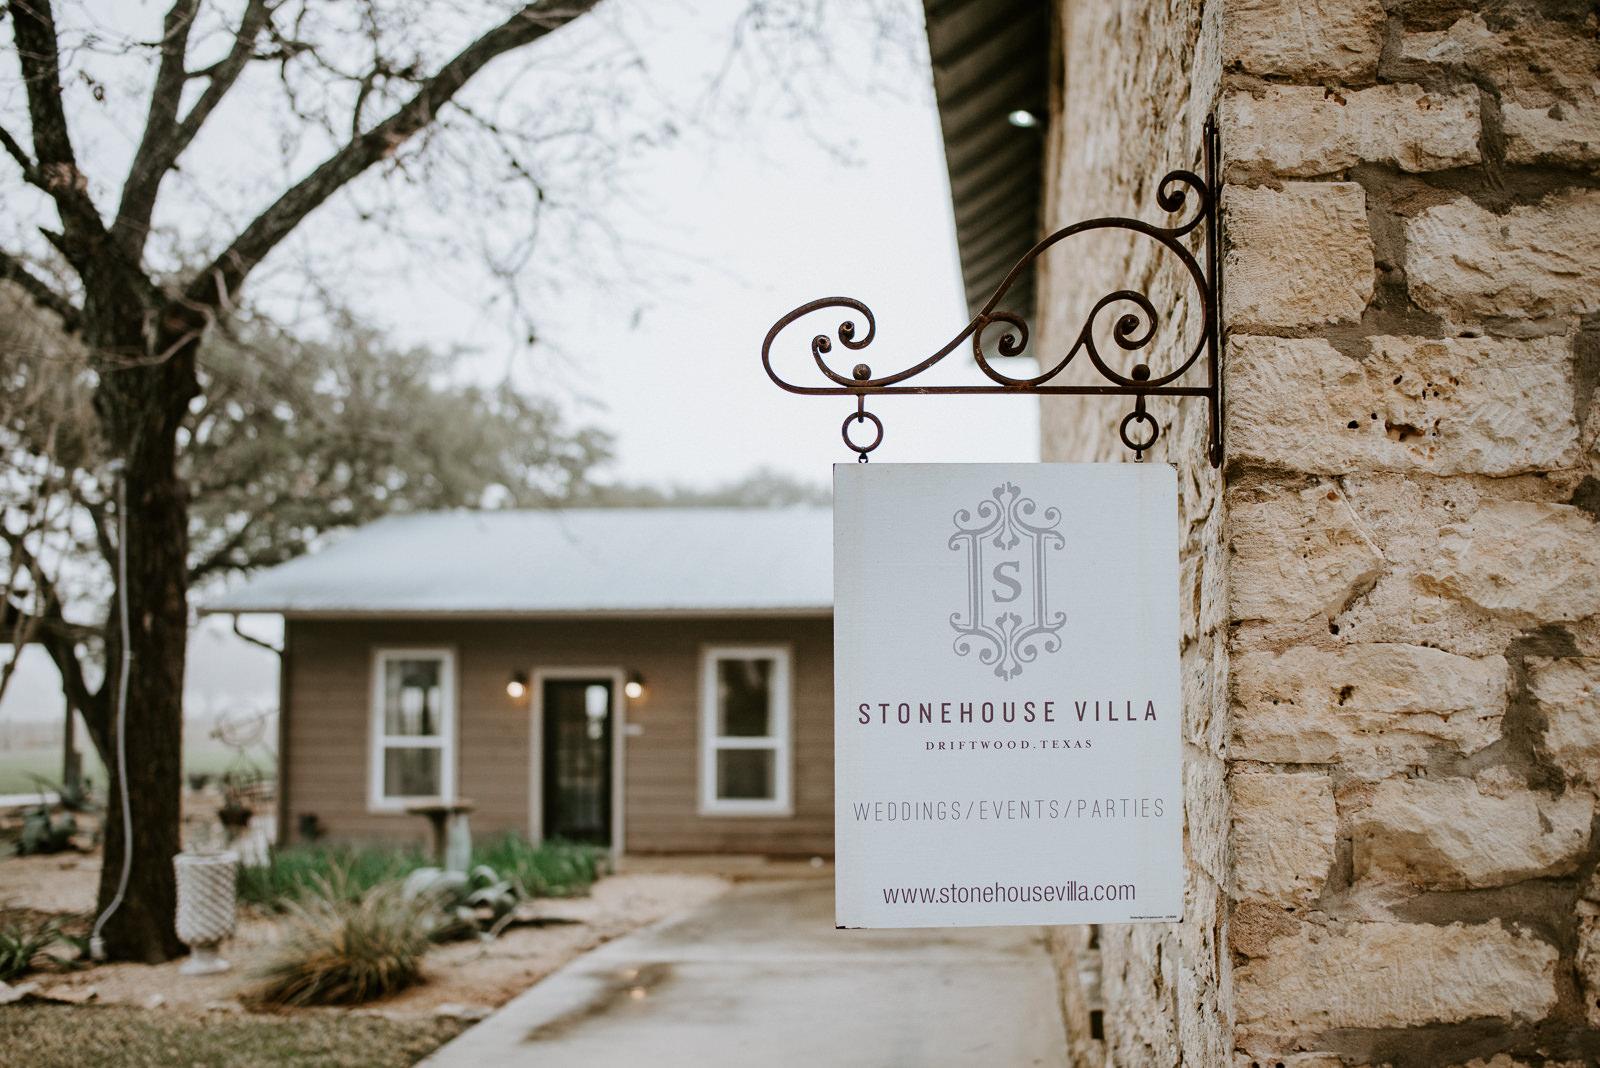 stonehouse villa in driftwood texas